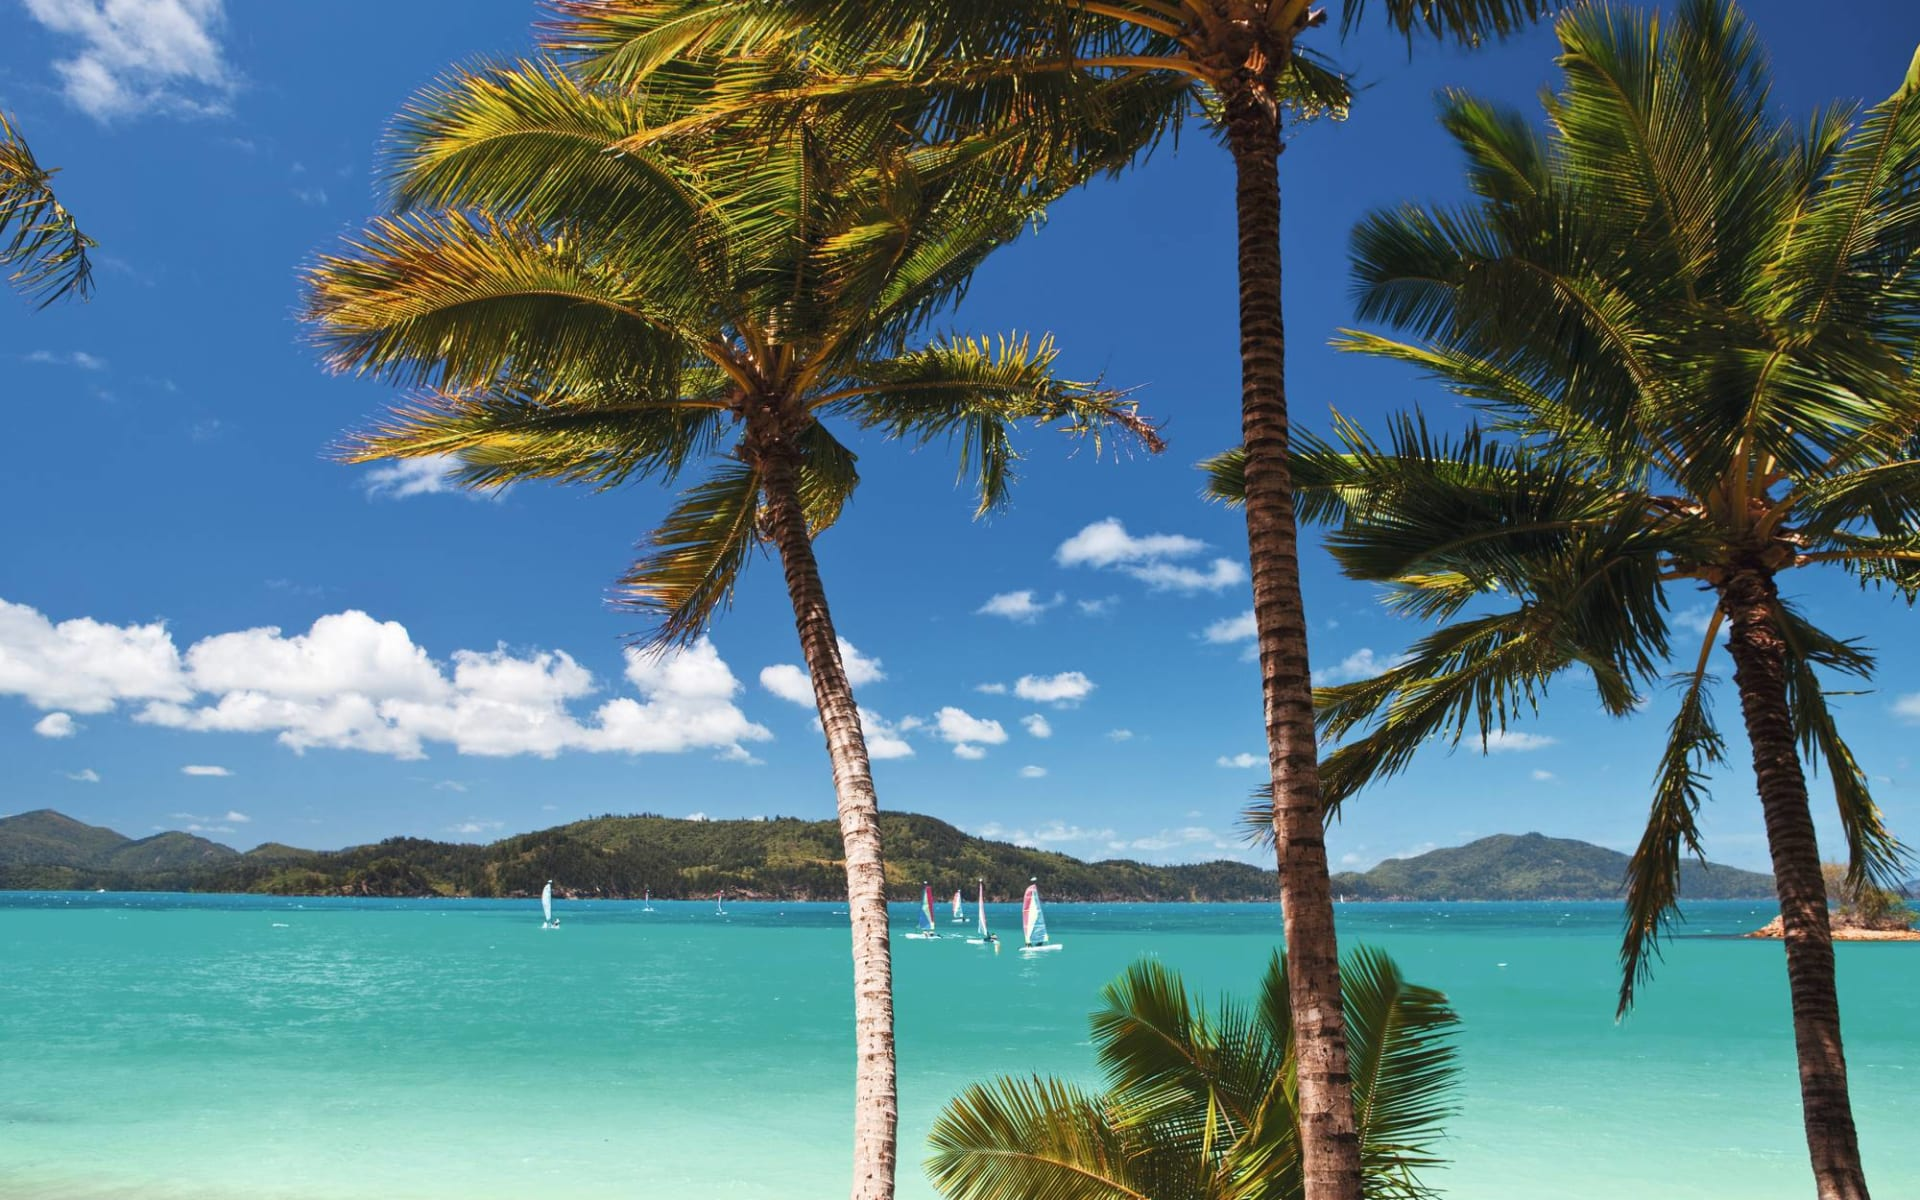 Reef View Hotel in Hamilton Island: Natur Hamilton Island Queensland Australien  c shutterstock_501597214 2017